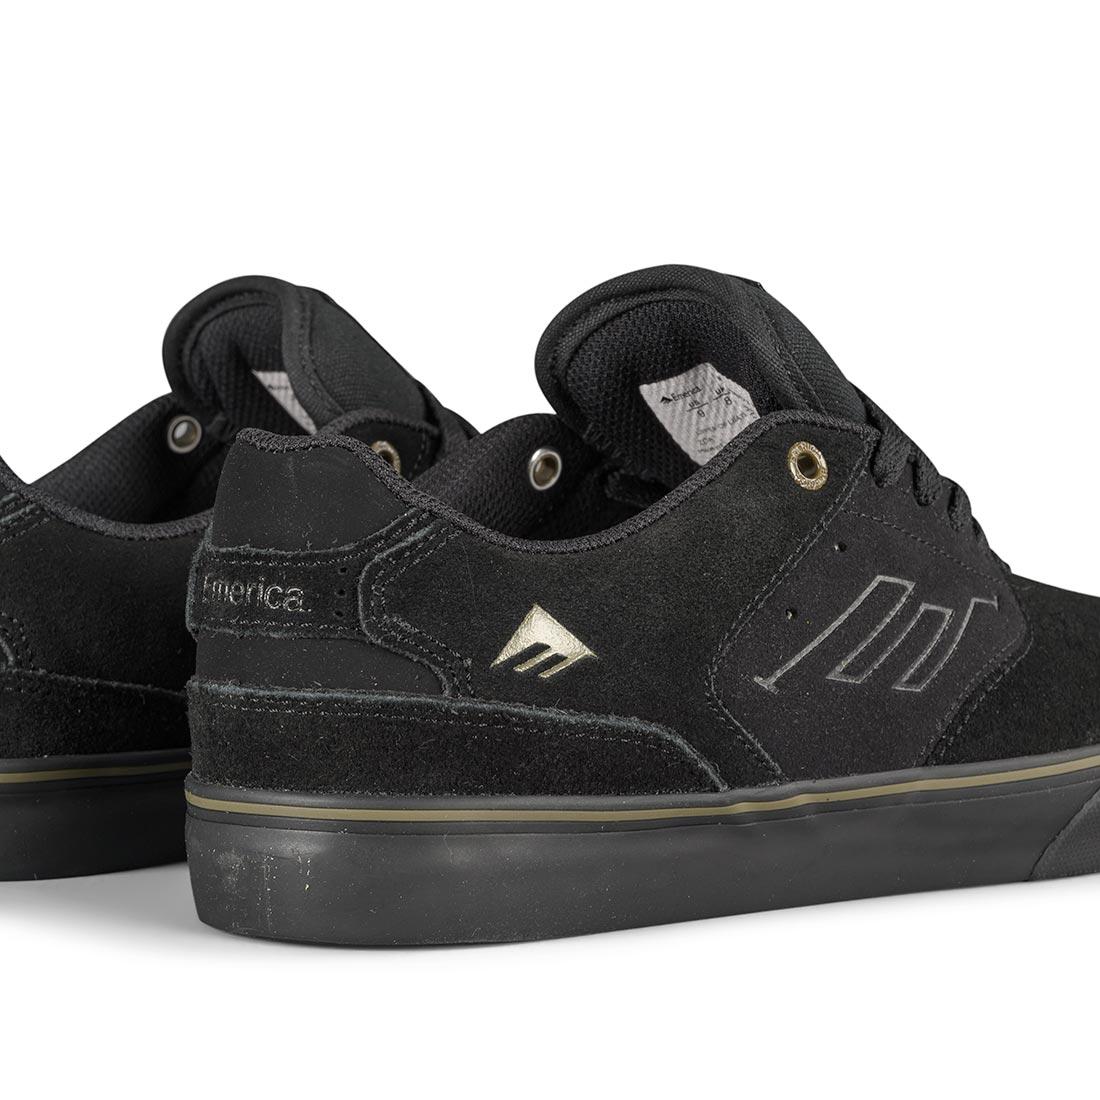 Emerica Reynolds Low Vulc Shoes - Black